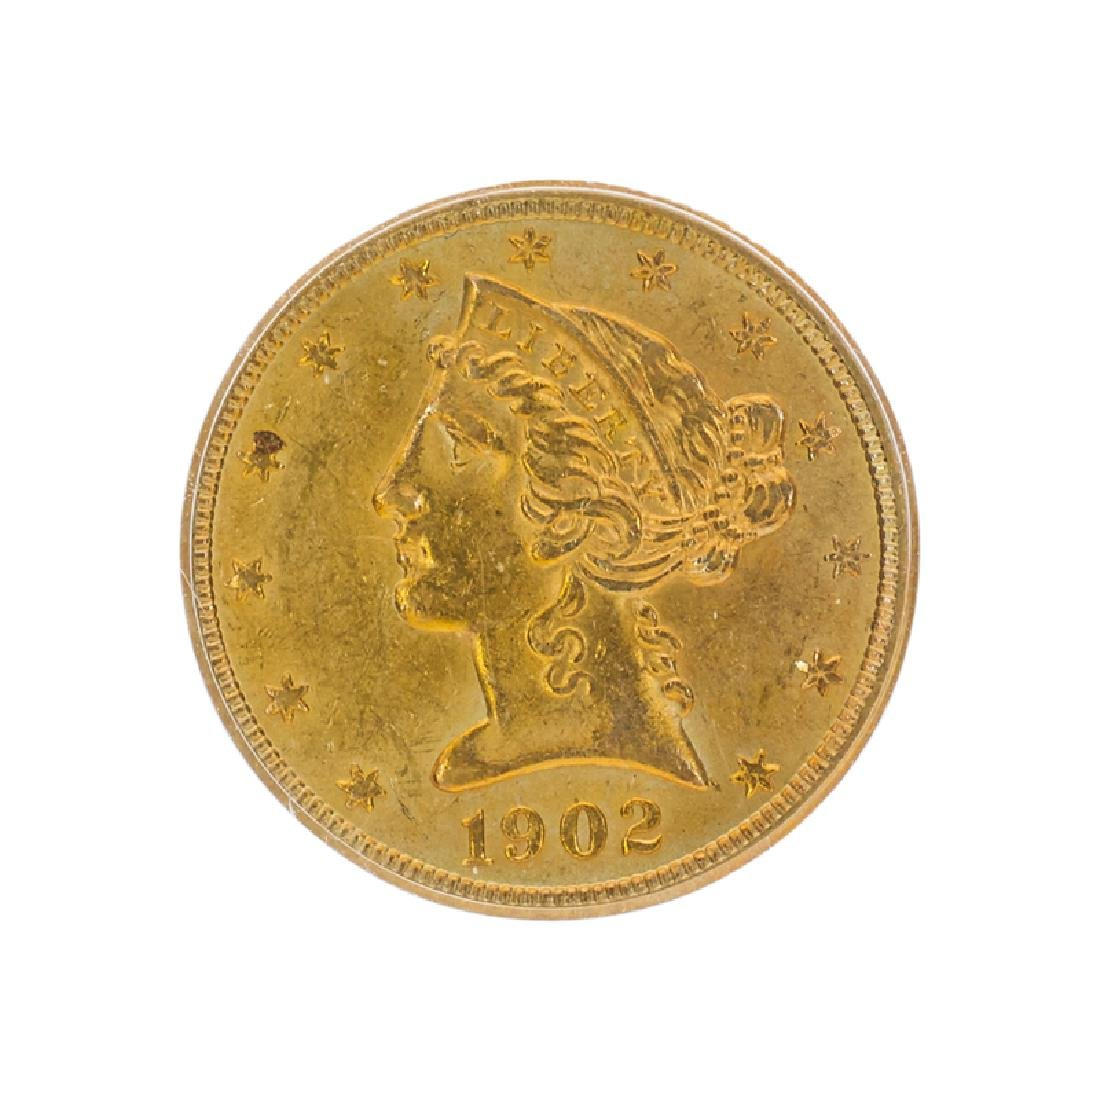 U.S. 1902-S $5.00 LIBERTY HEAD GOLD COIN